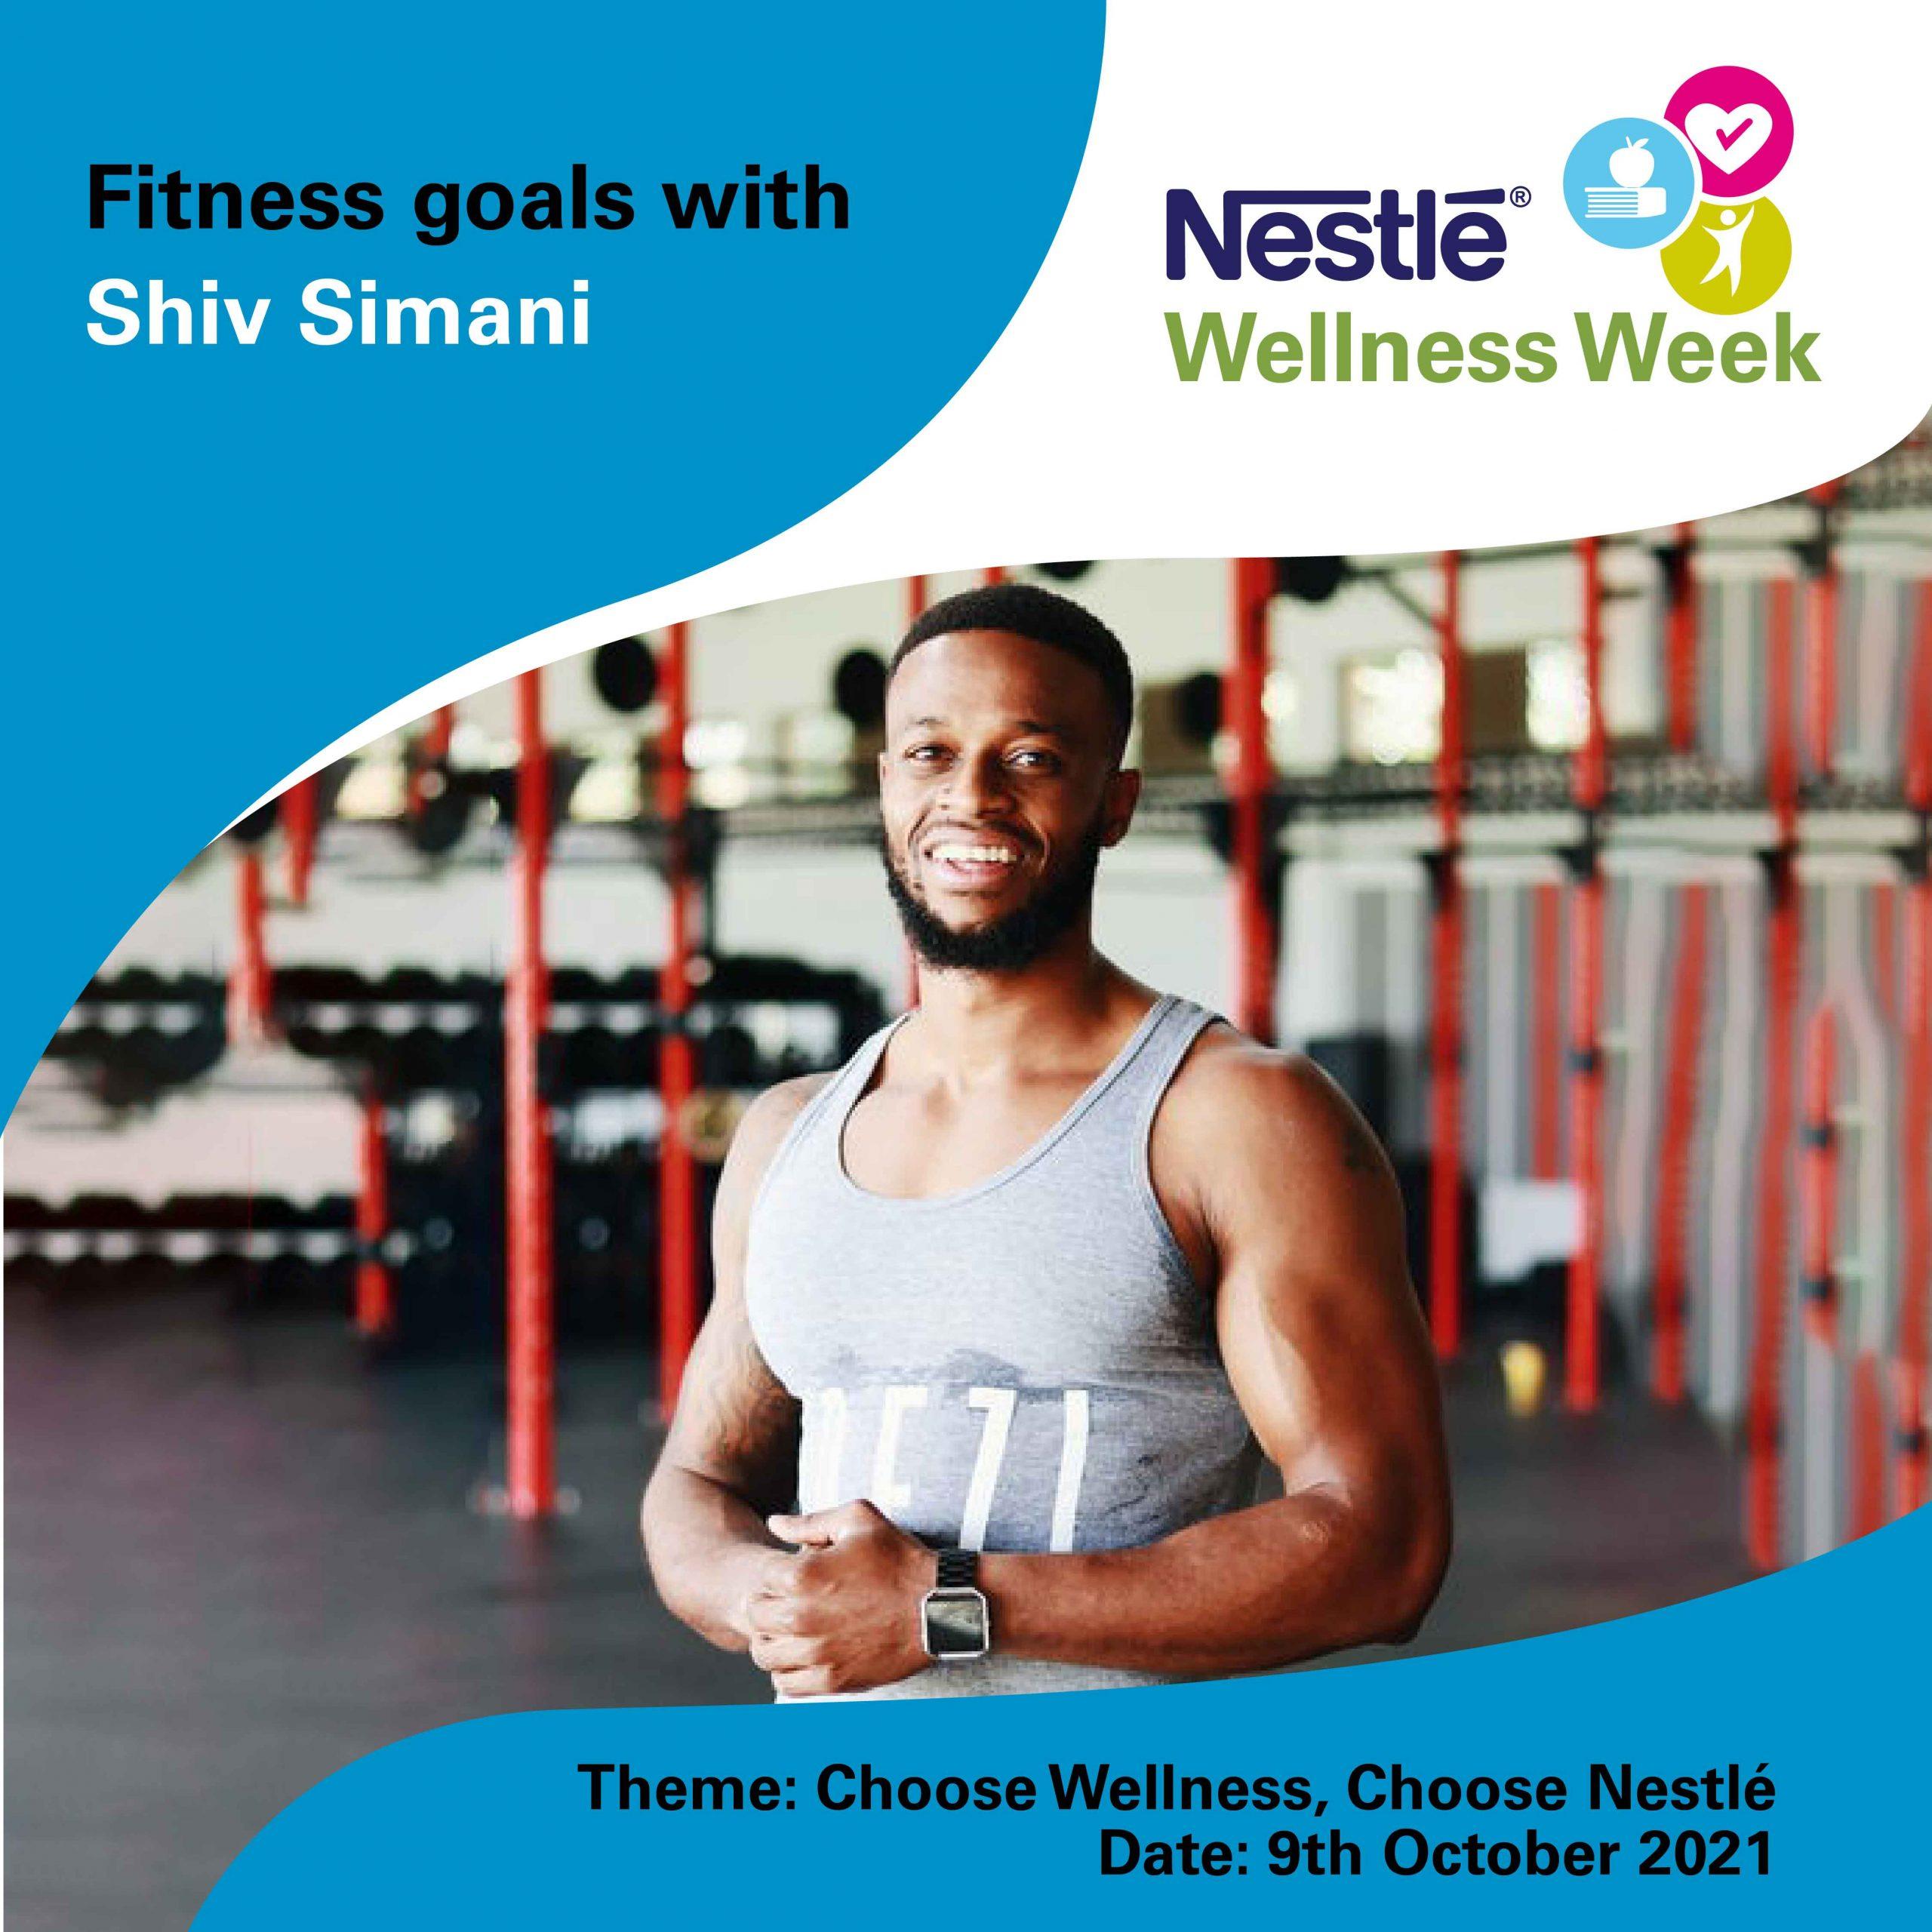 Shiv Simani - Nestlé Wellness Week